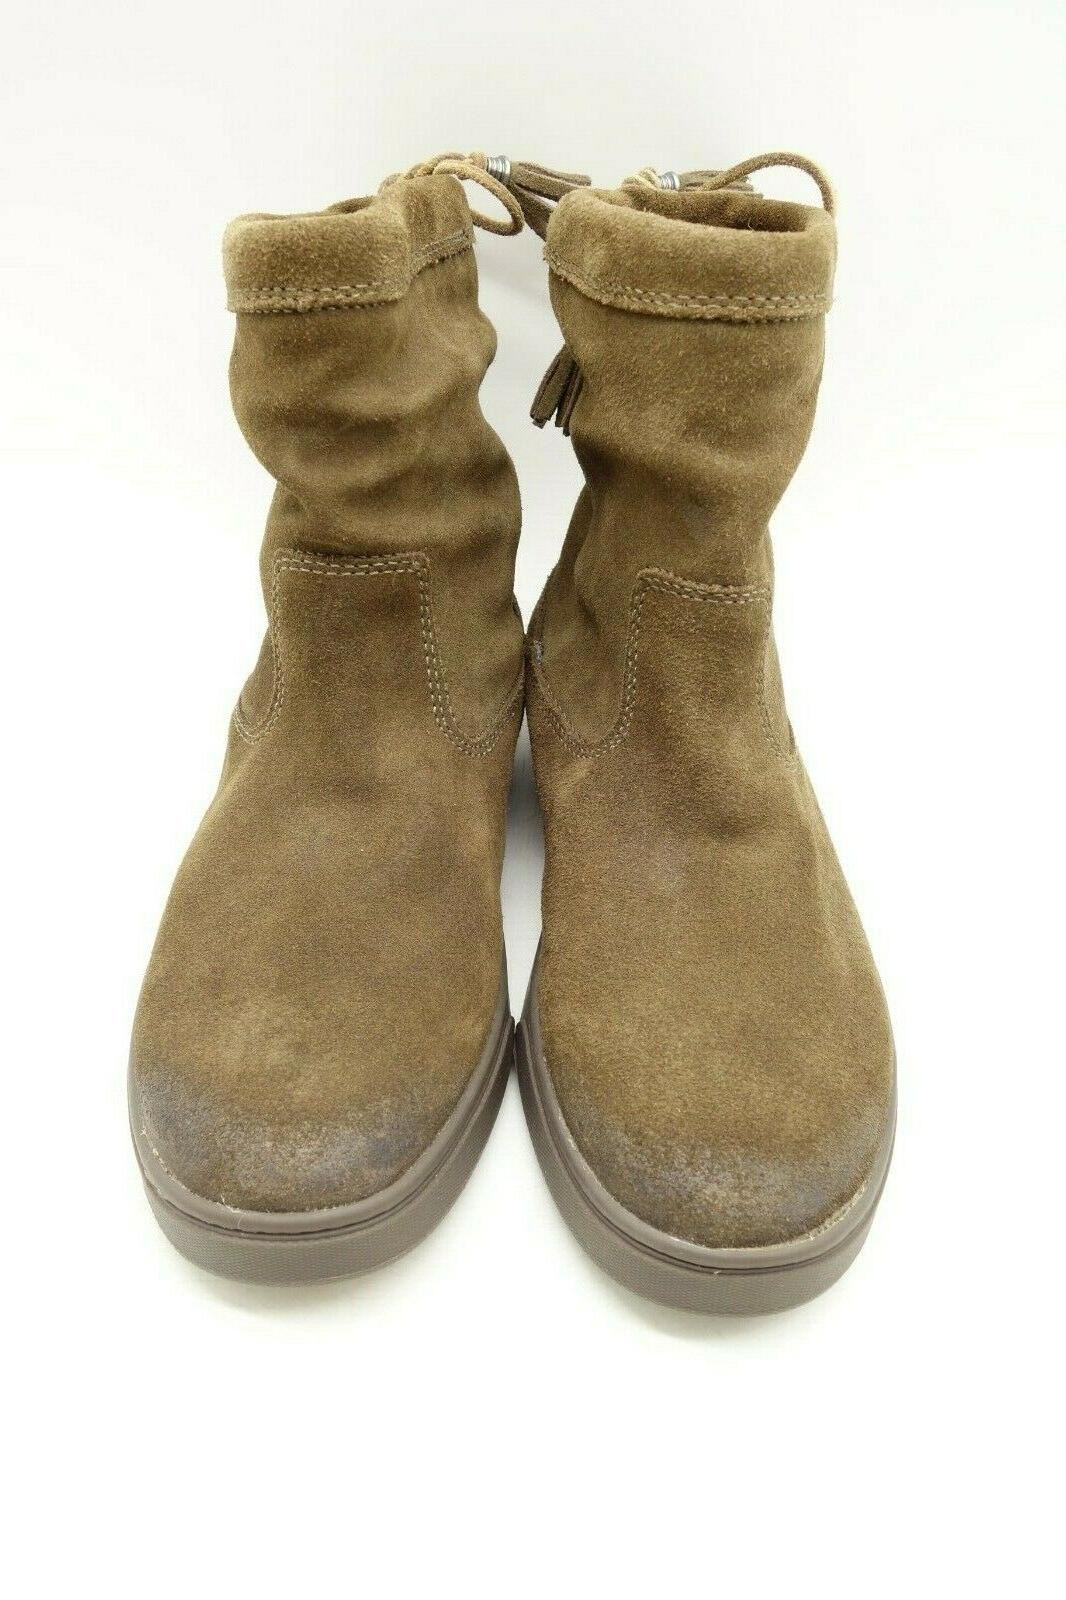 Olukai Kapa Tassel Leather Pull On Ankle Boots Shoes Women's